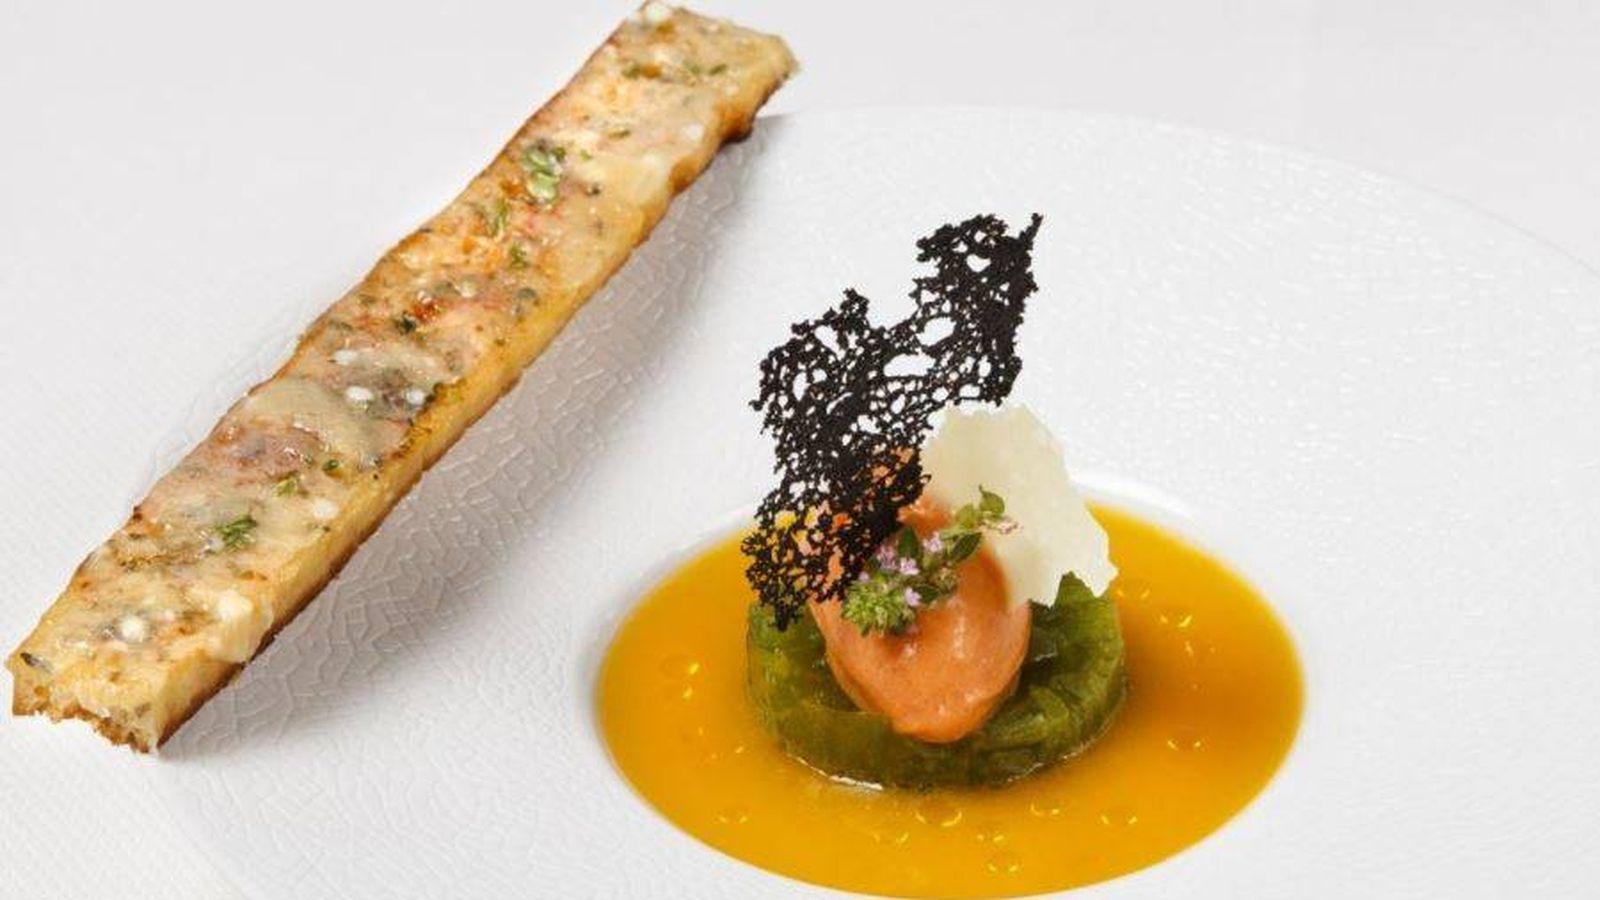 Gastronomía: Epicure, de Eric Frechon, una cara e